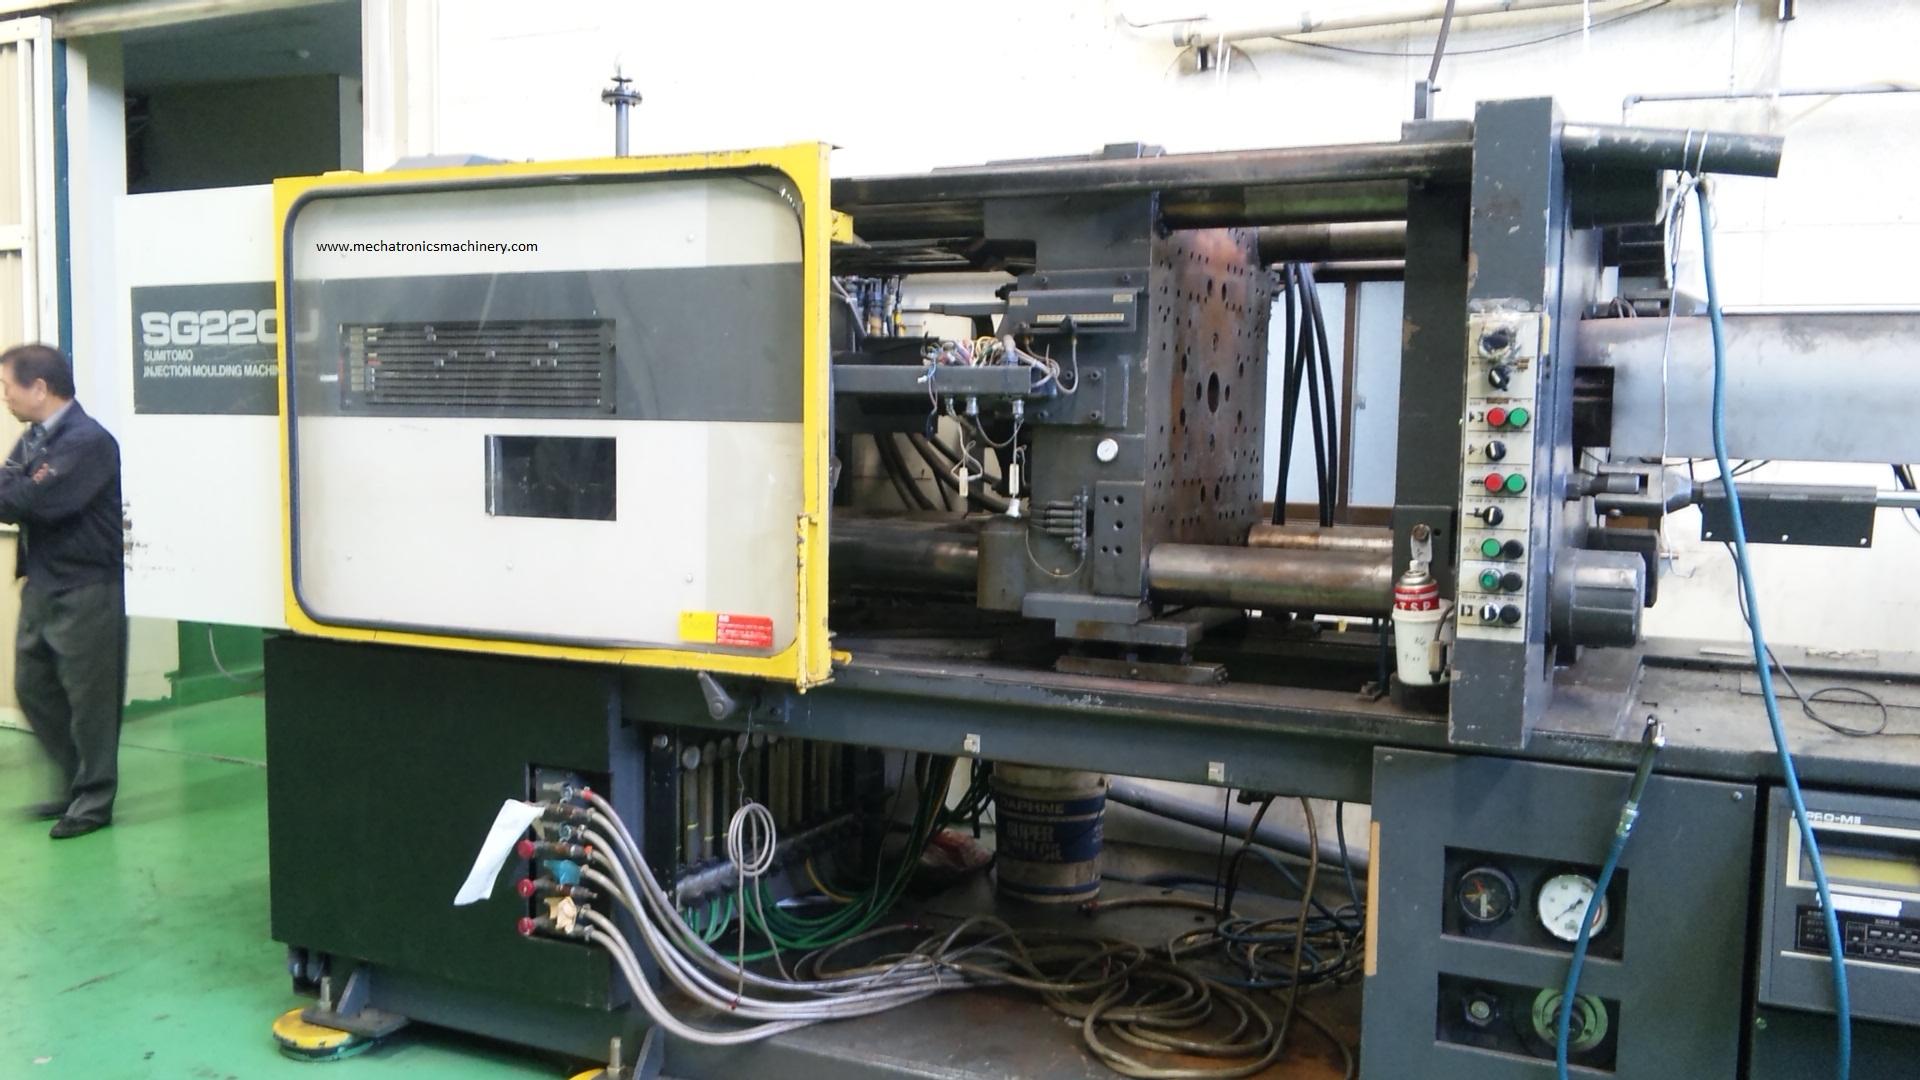 Sumitomo Sh220 Injection Moulding Machine Exapro